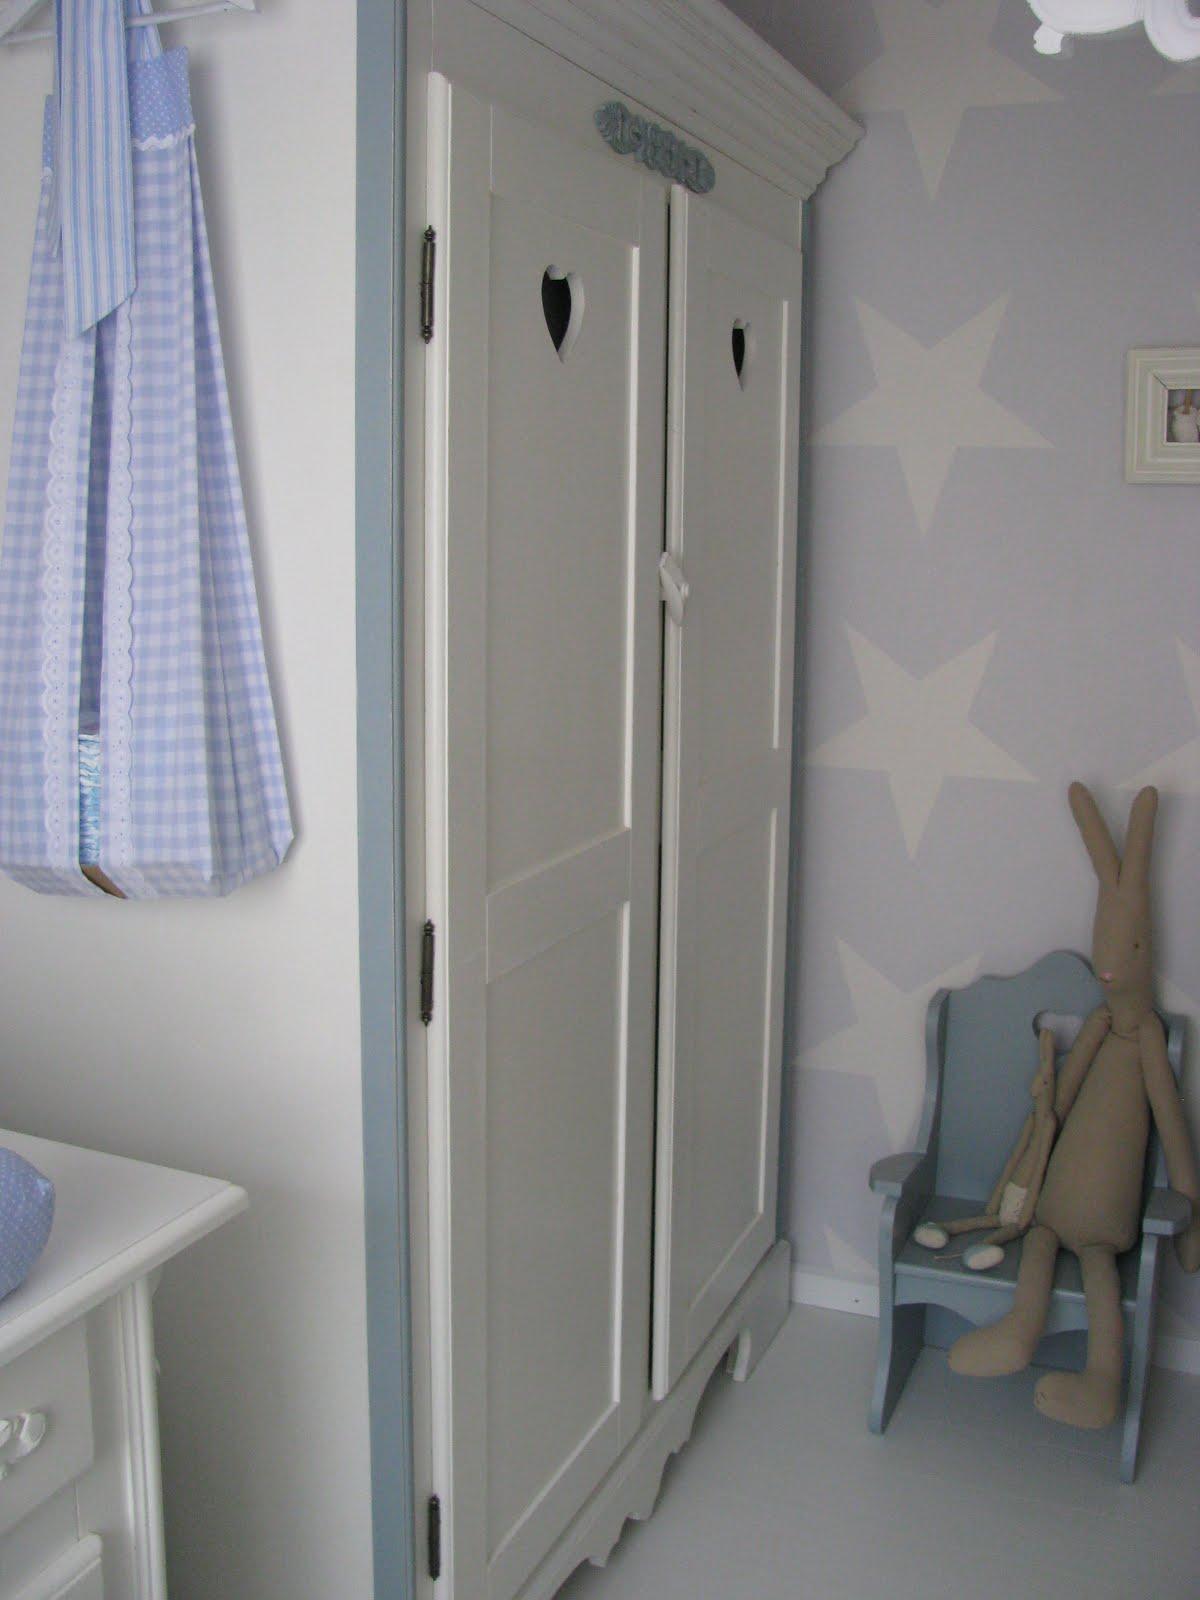 Babykamer behang konijn: behang babykamer goedkope babykamers ...